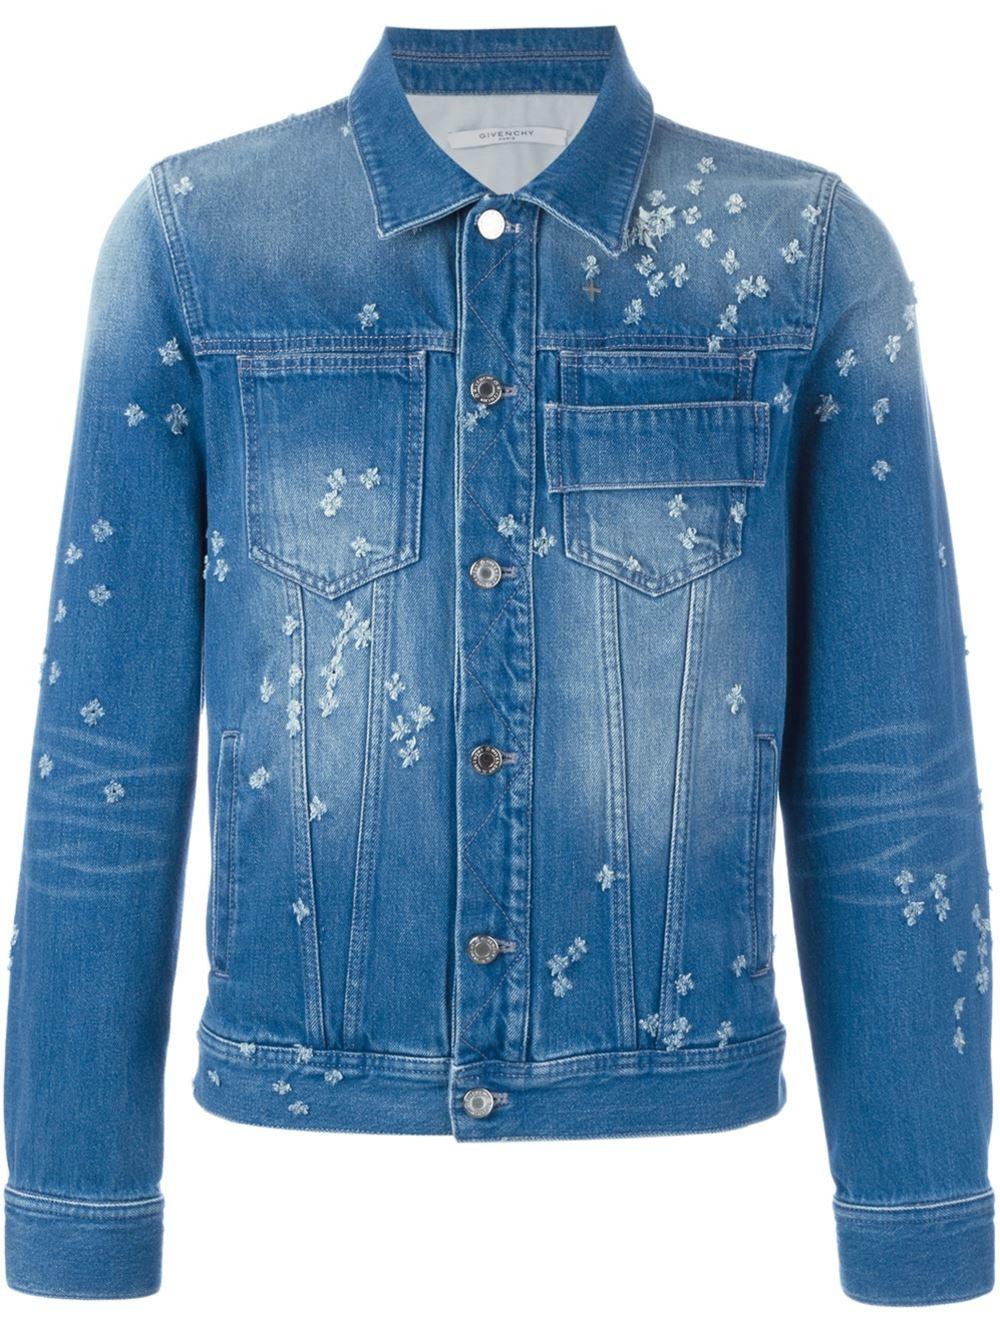 Givenchy Distressed Effect Denim Jacket in Blue for Men